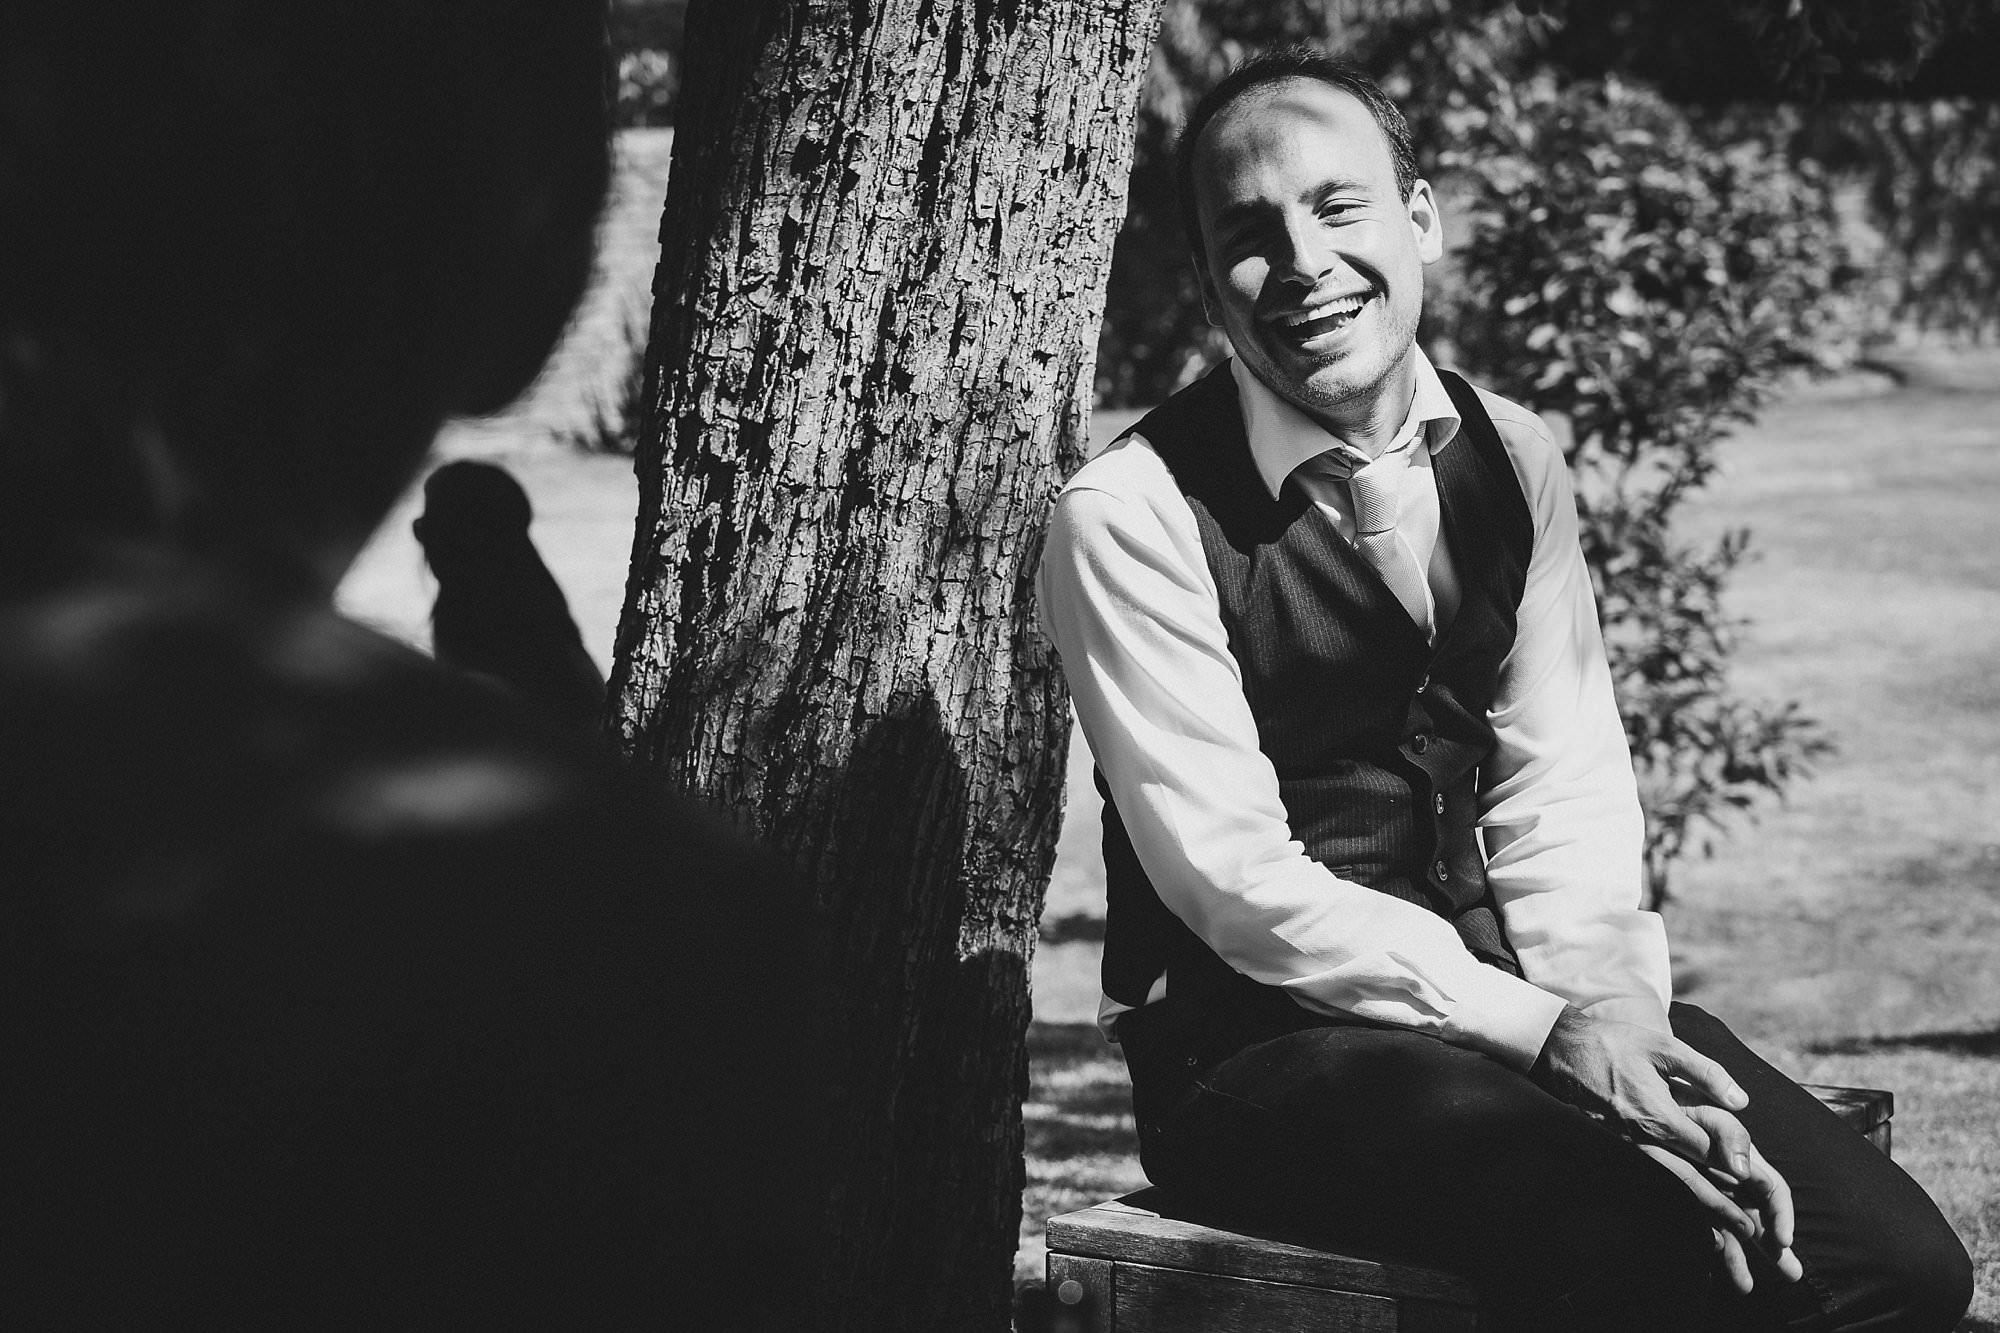 oaks farm wedding photographer cj 068 - Cat + Jake   Oaks Farm Wedding Photography